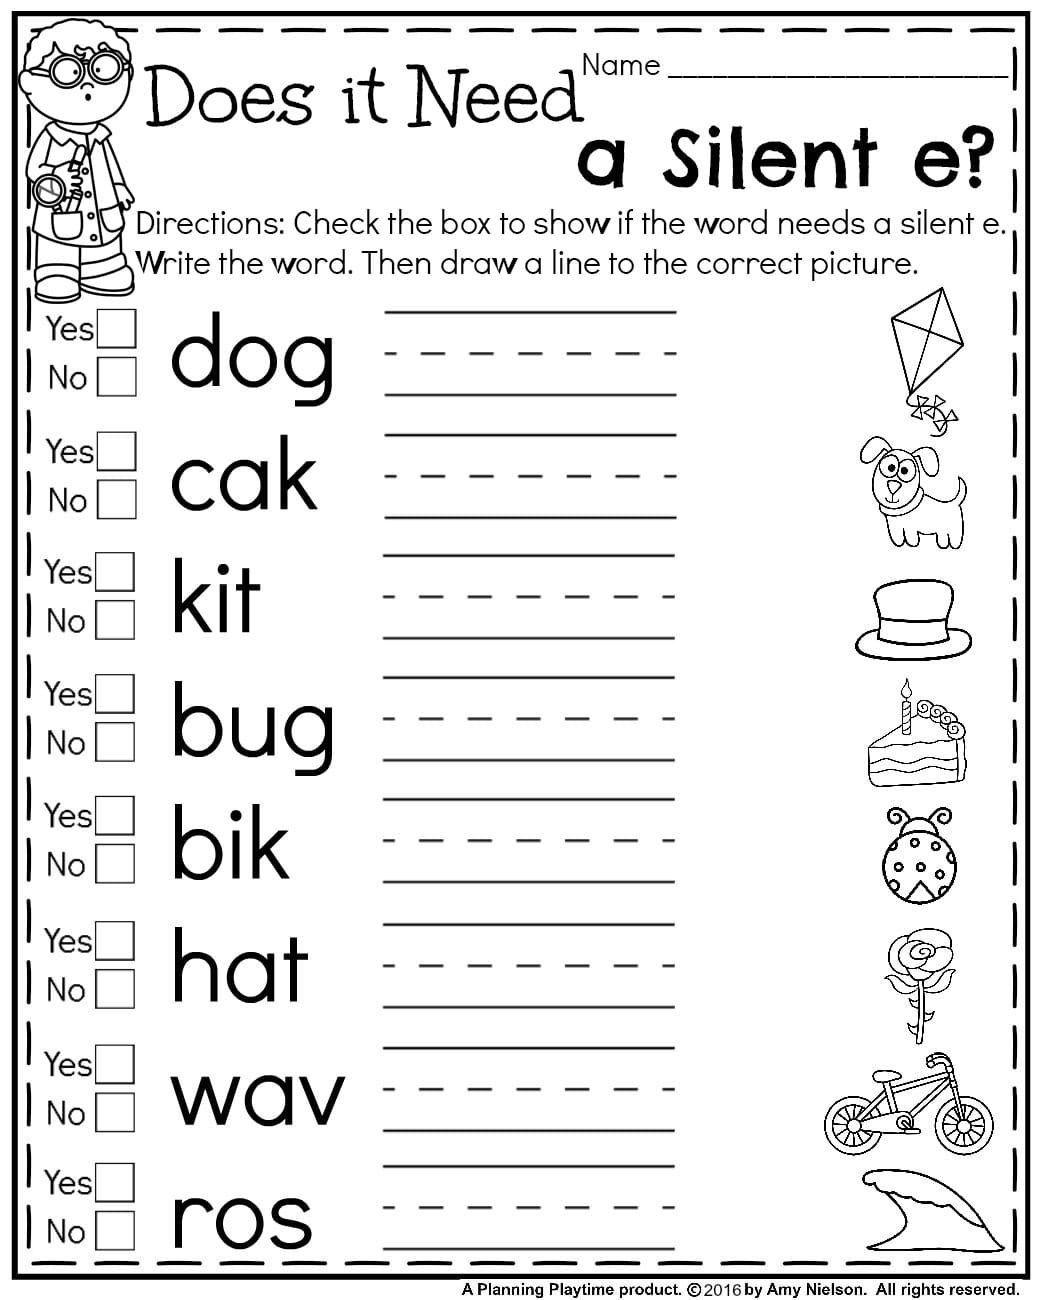 Blending Worksheets 1st Grade First Grade Summer Worksheets With Images In 2020 2nd Grade Worksheets First Grade Worksheets 1st Grade Worksheets